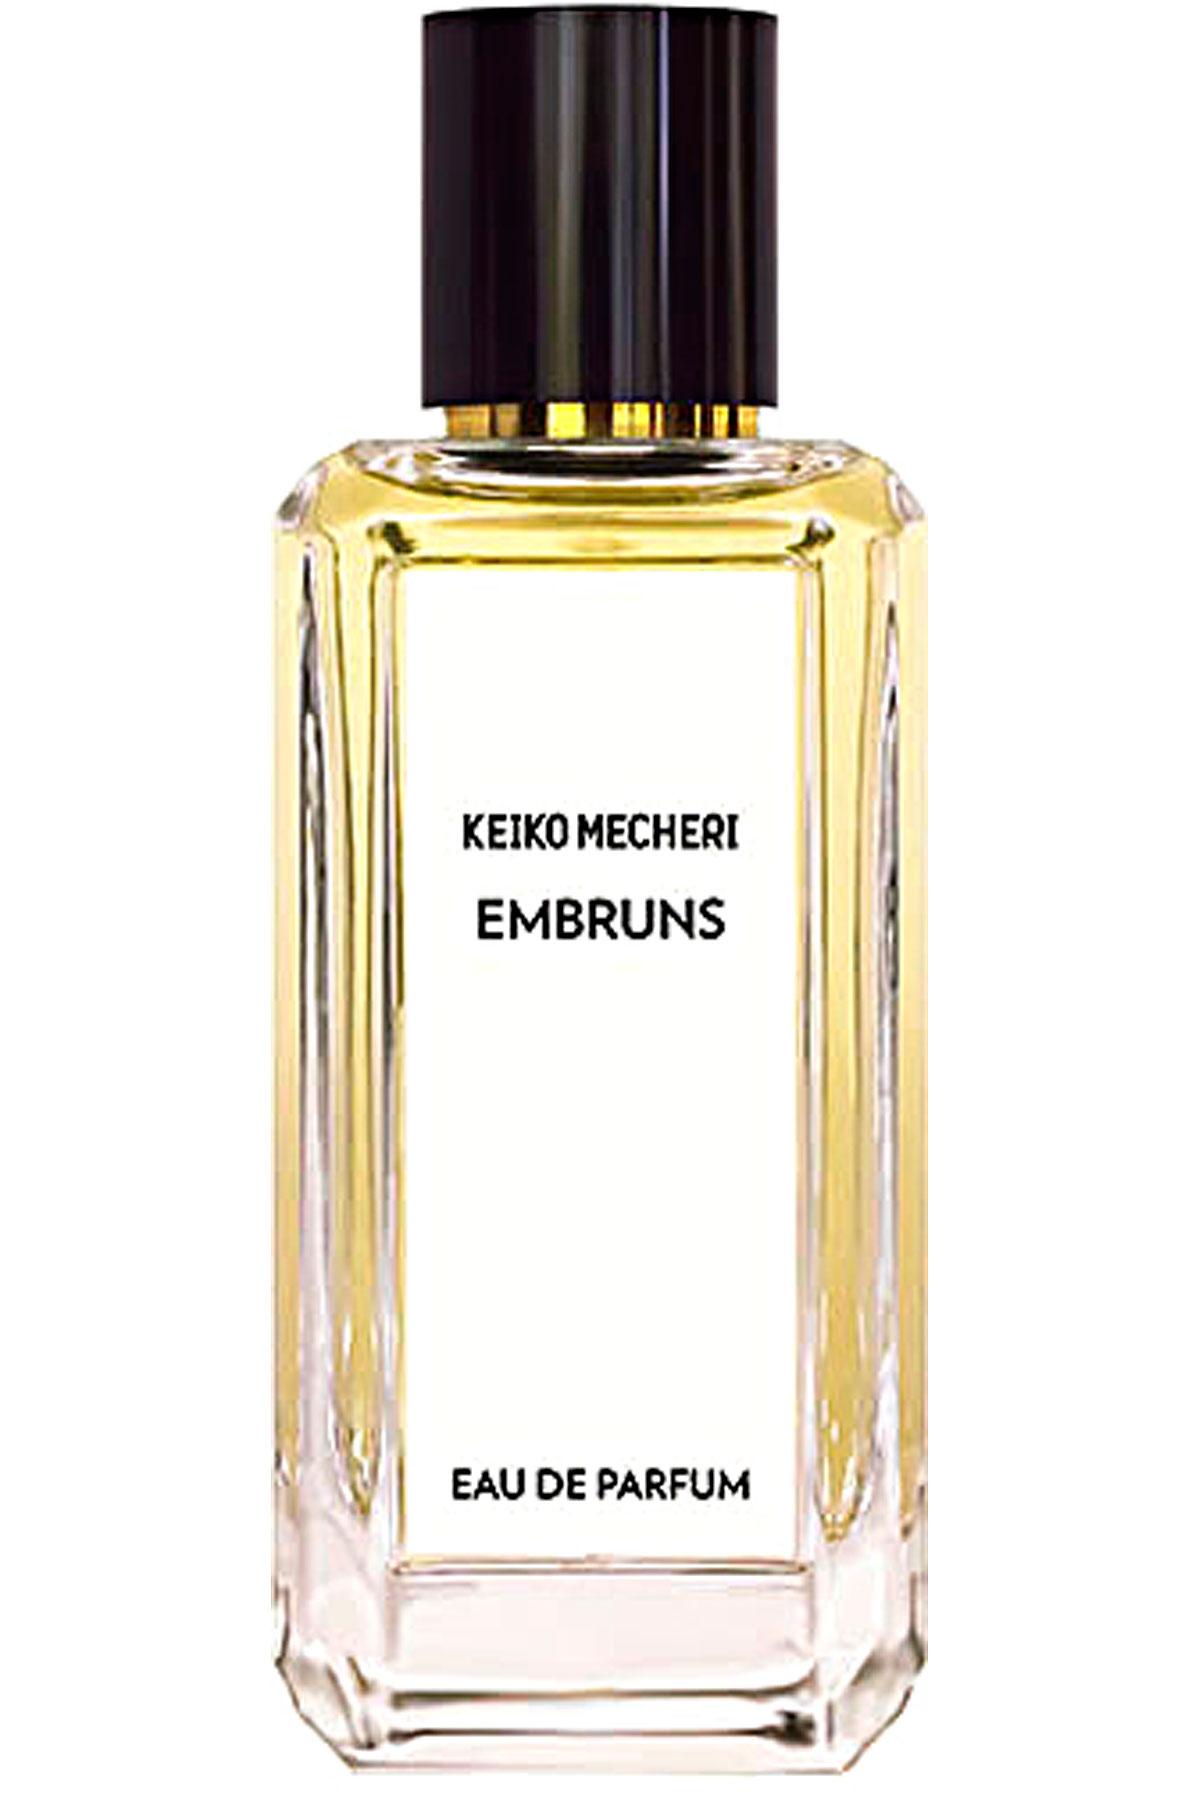 Keiko Mecheri Fragrances for Women, Embruns - Eau De Parfum - 100 Ml, 2019, 100 ml